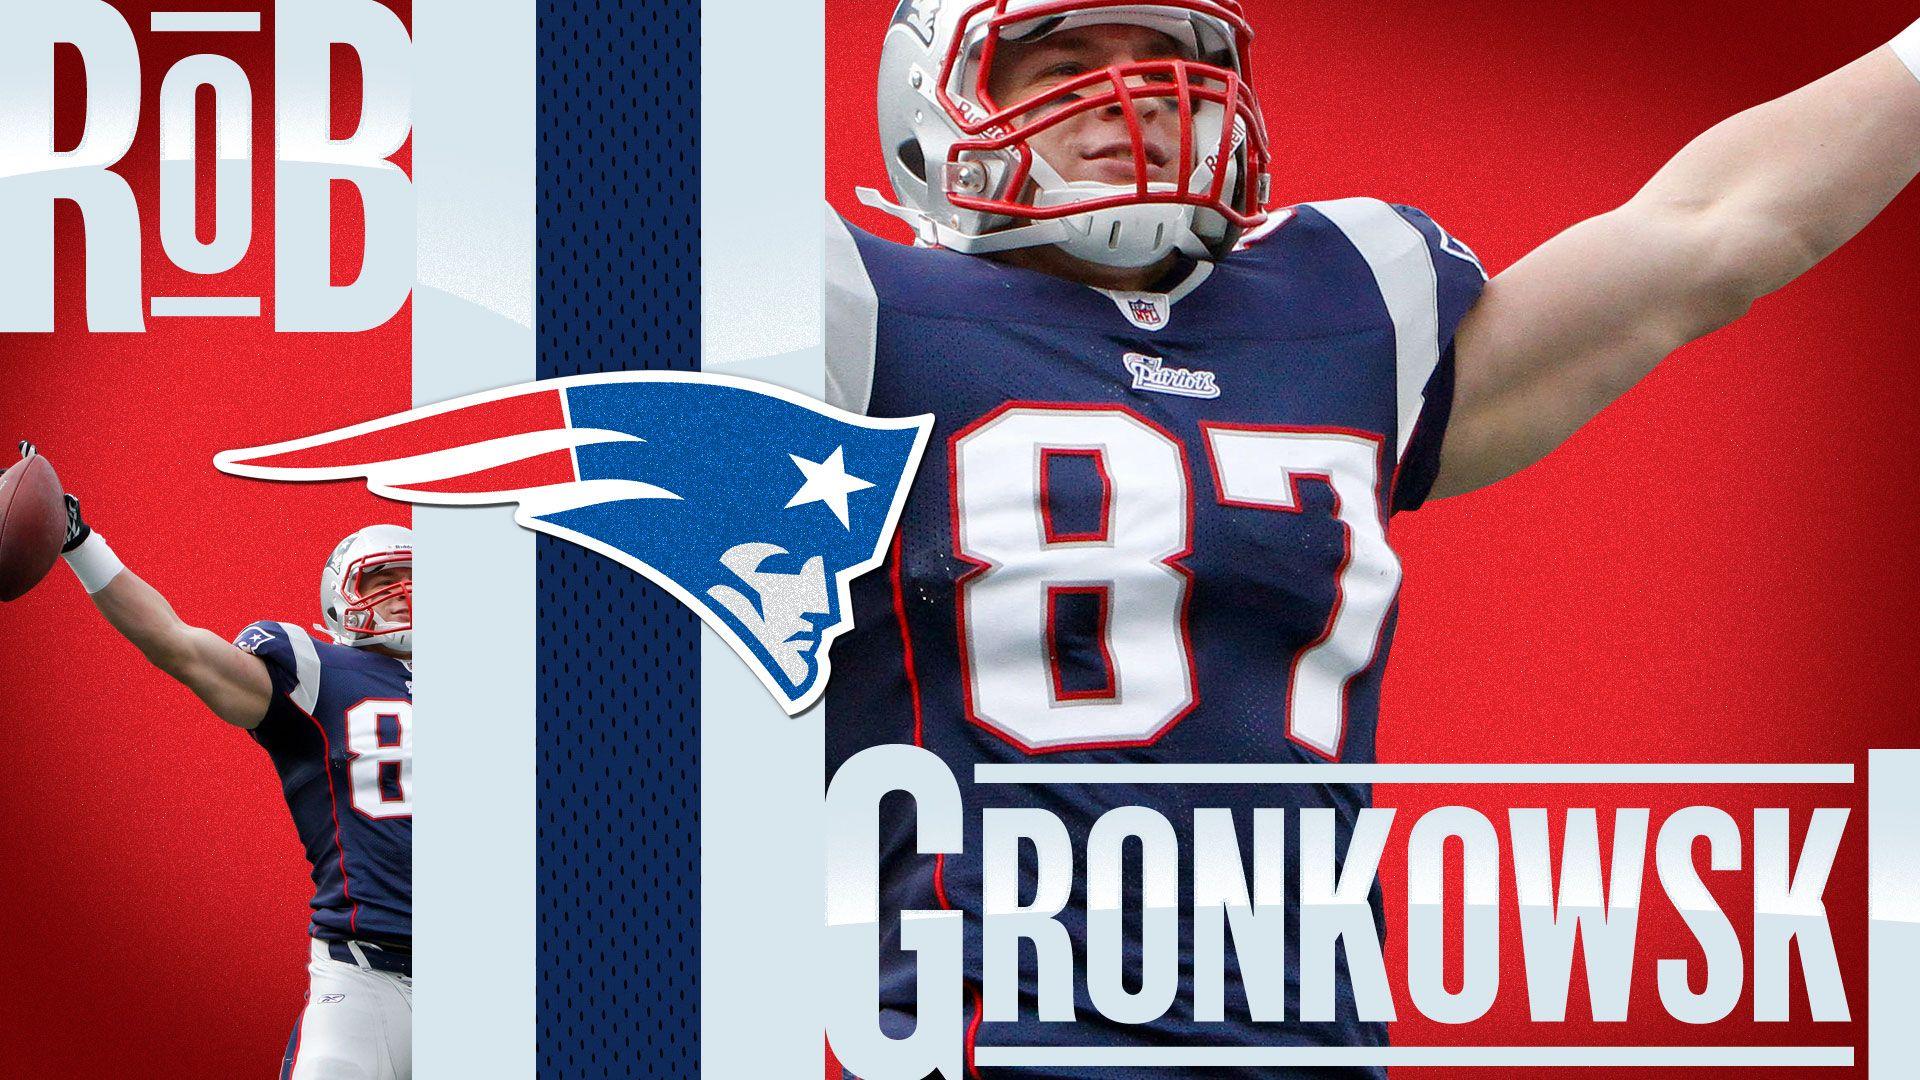 Rob Gronkowski New England Patriots Desktop 4K Wallpapers